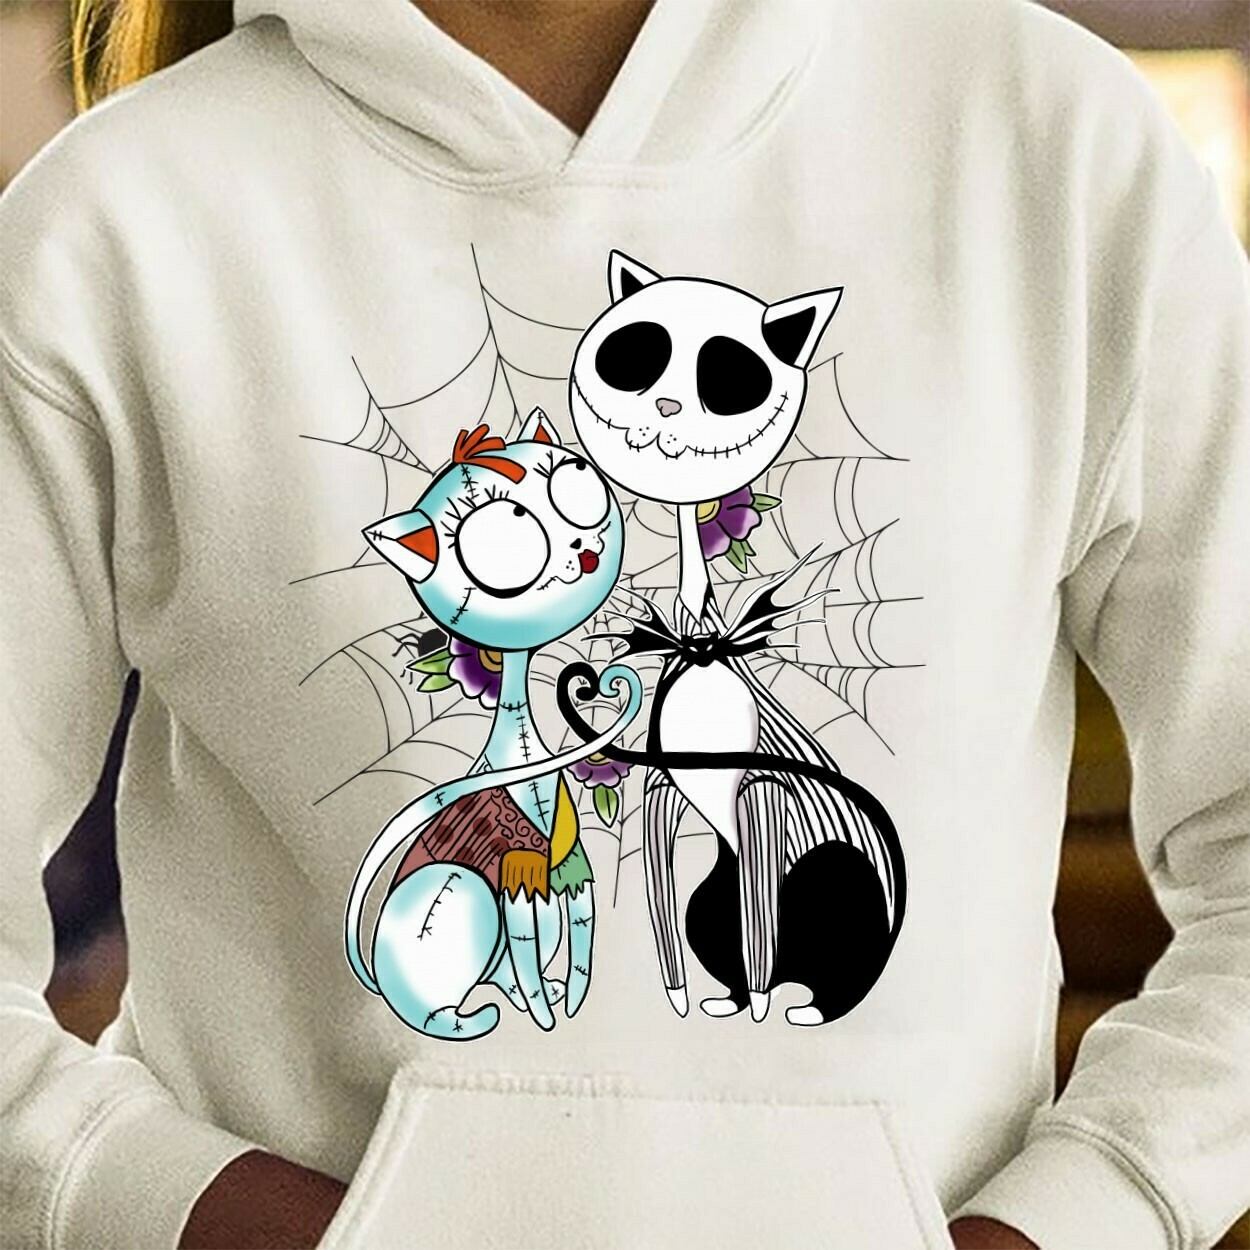 Cat Halloween Jack Skellington Sally Hocus Pocus The nightmare before Christmas T-Shirt Long Sleeve Sweatshirt Hoodie Jolly Family Gifts